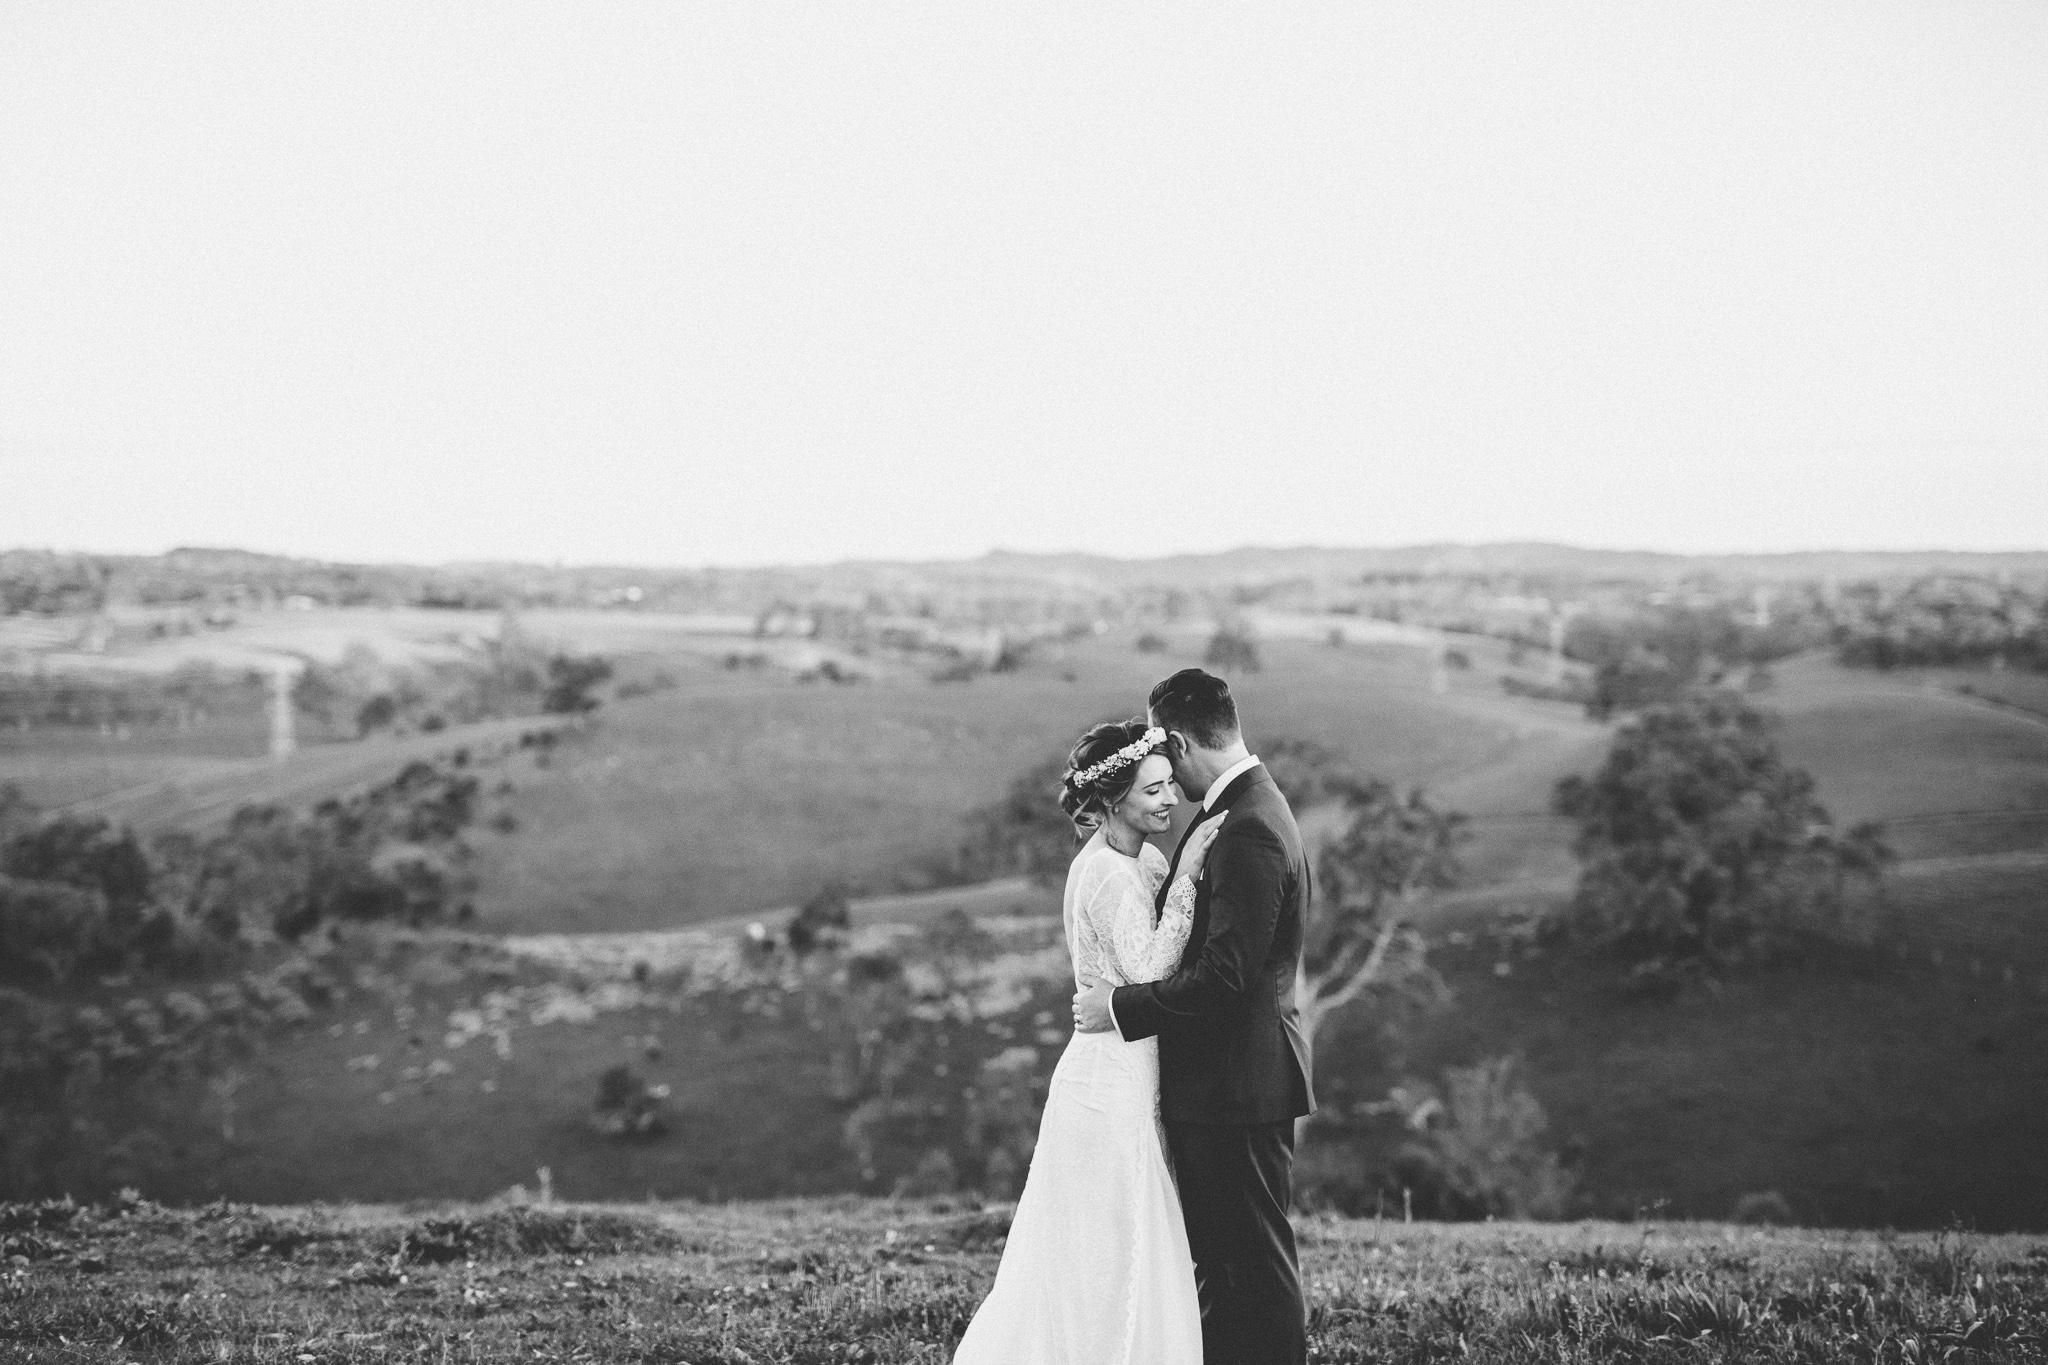 christopher morrison_adelaide hills wedding_ andy + teegan_85_1047.jpg